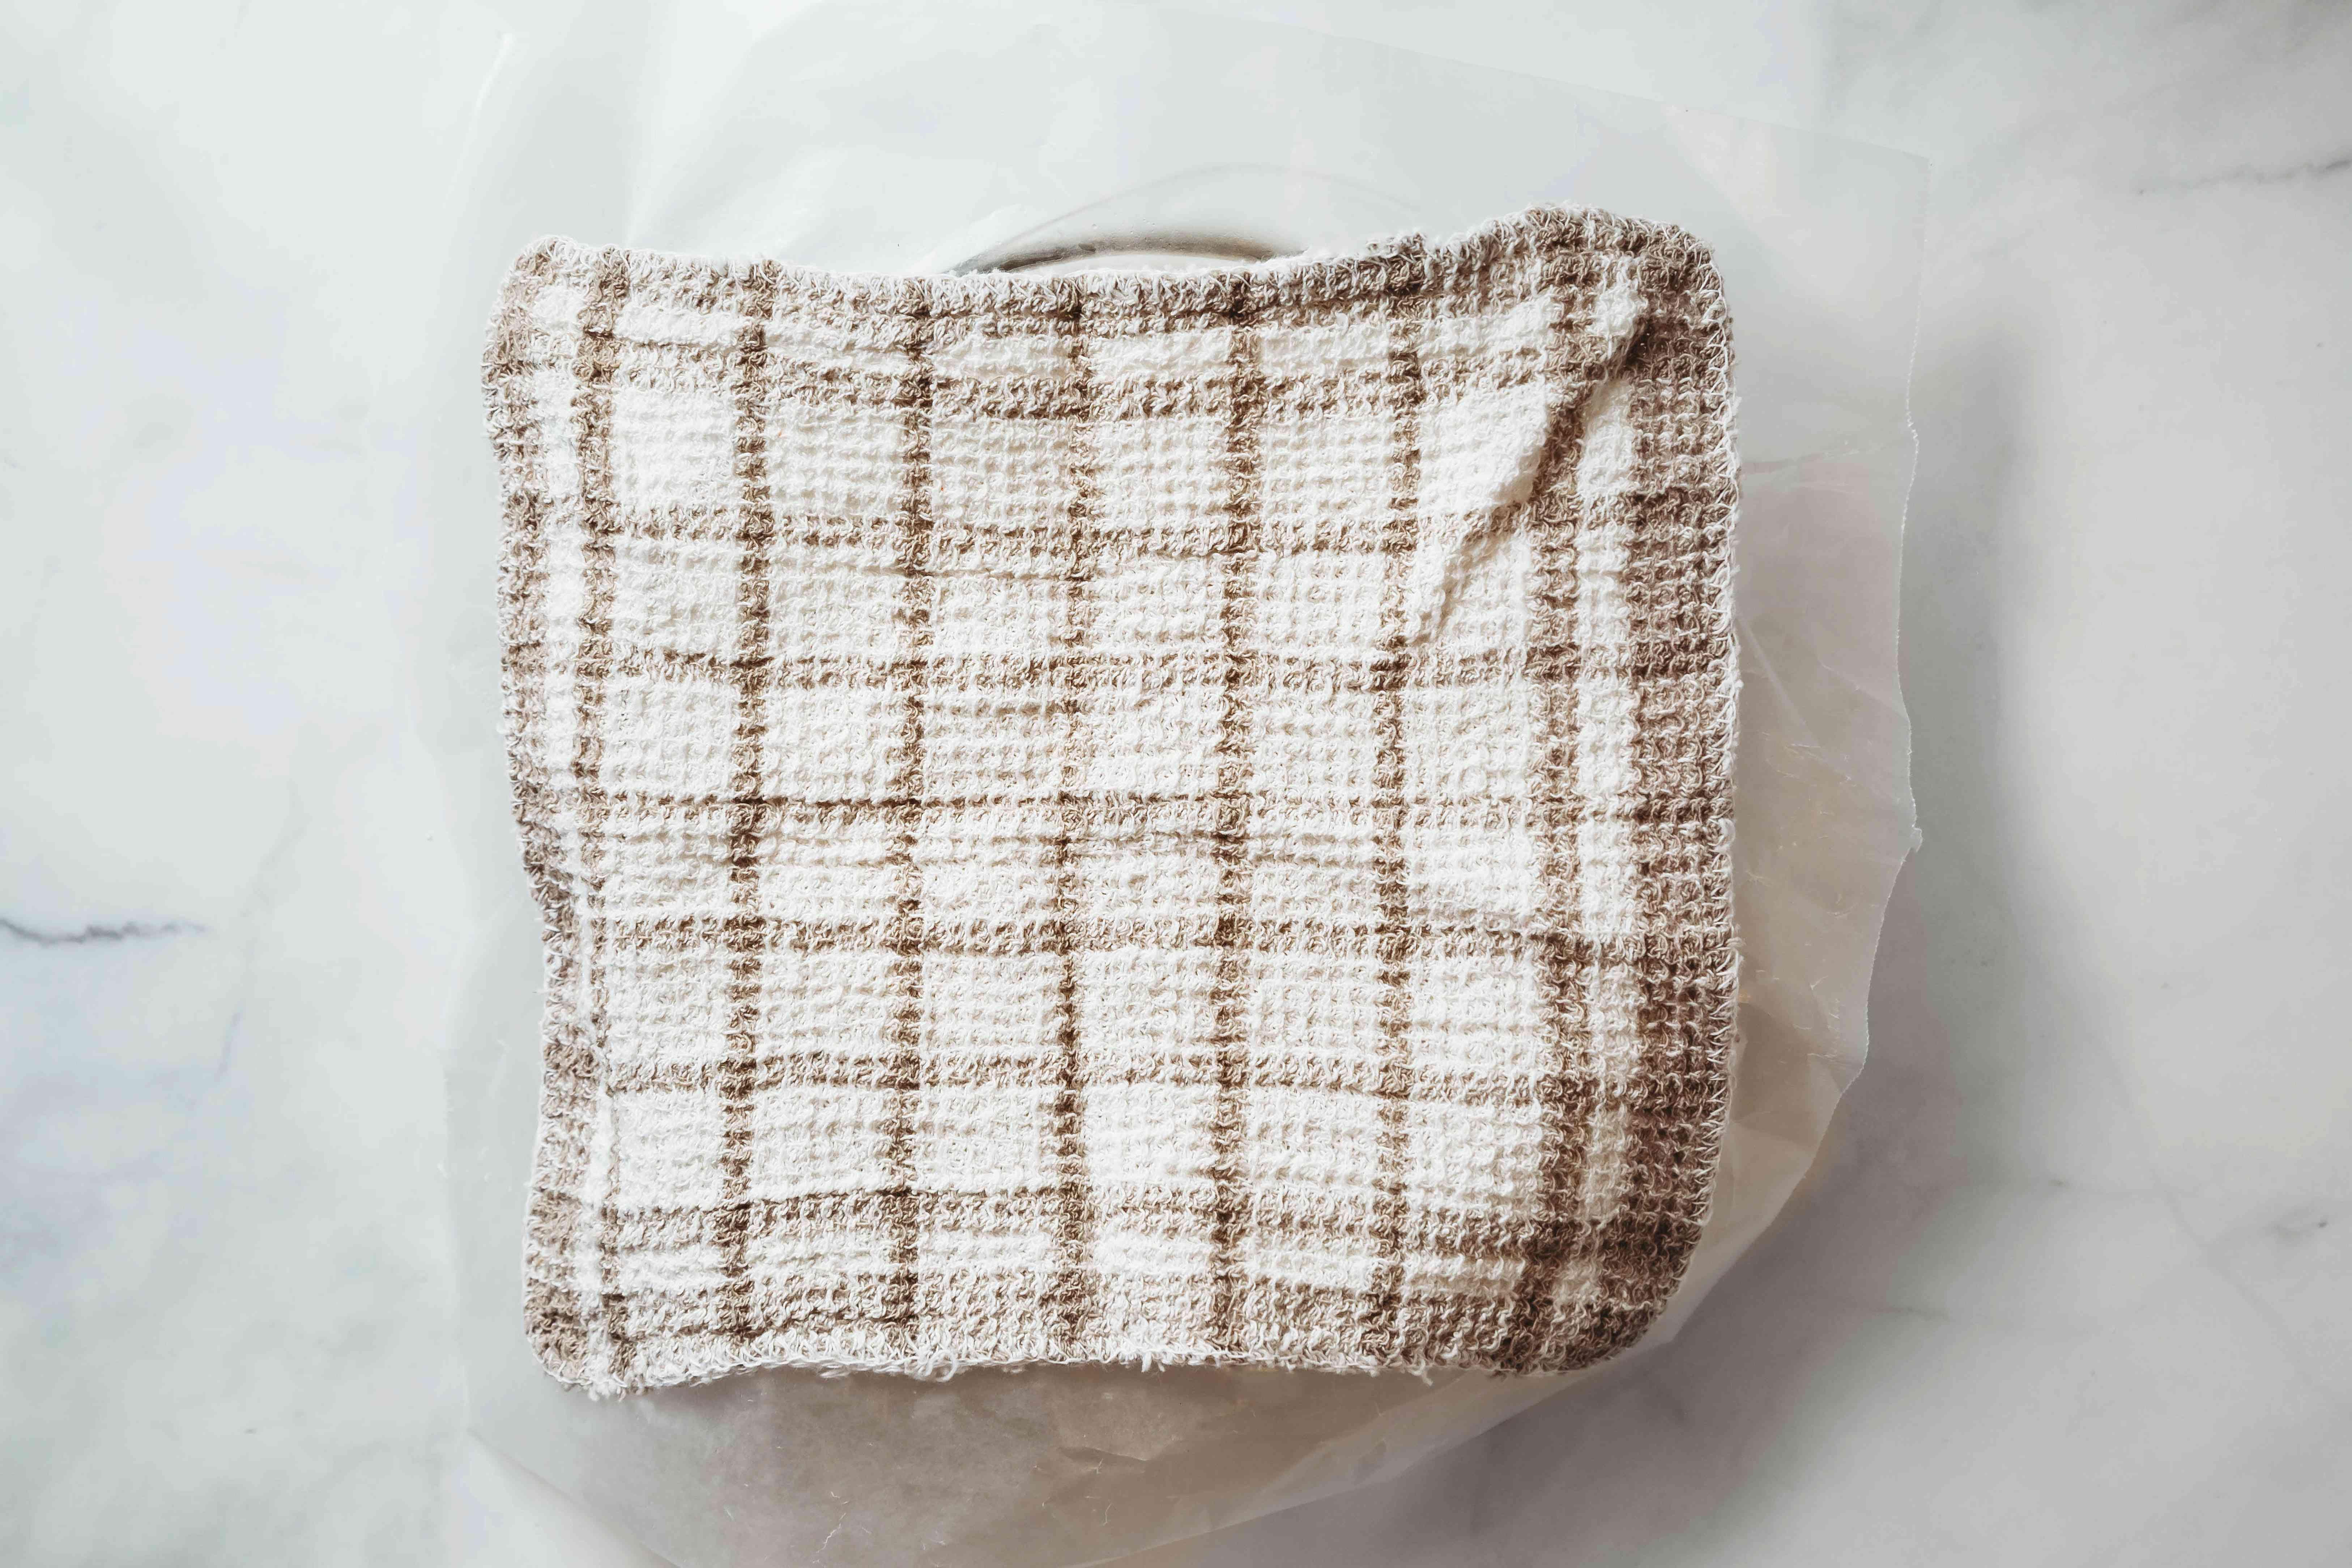 dough resting under a towel